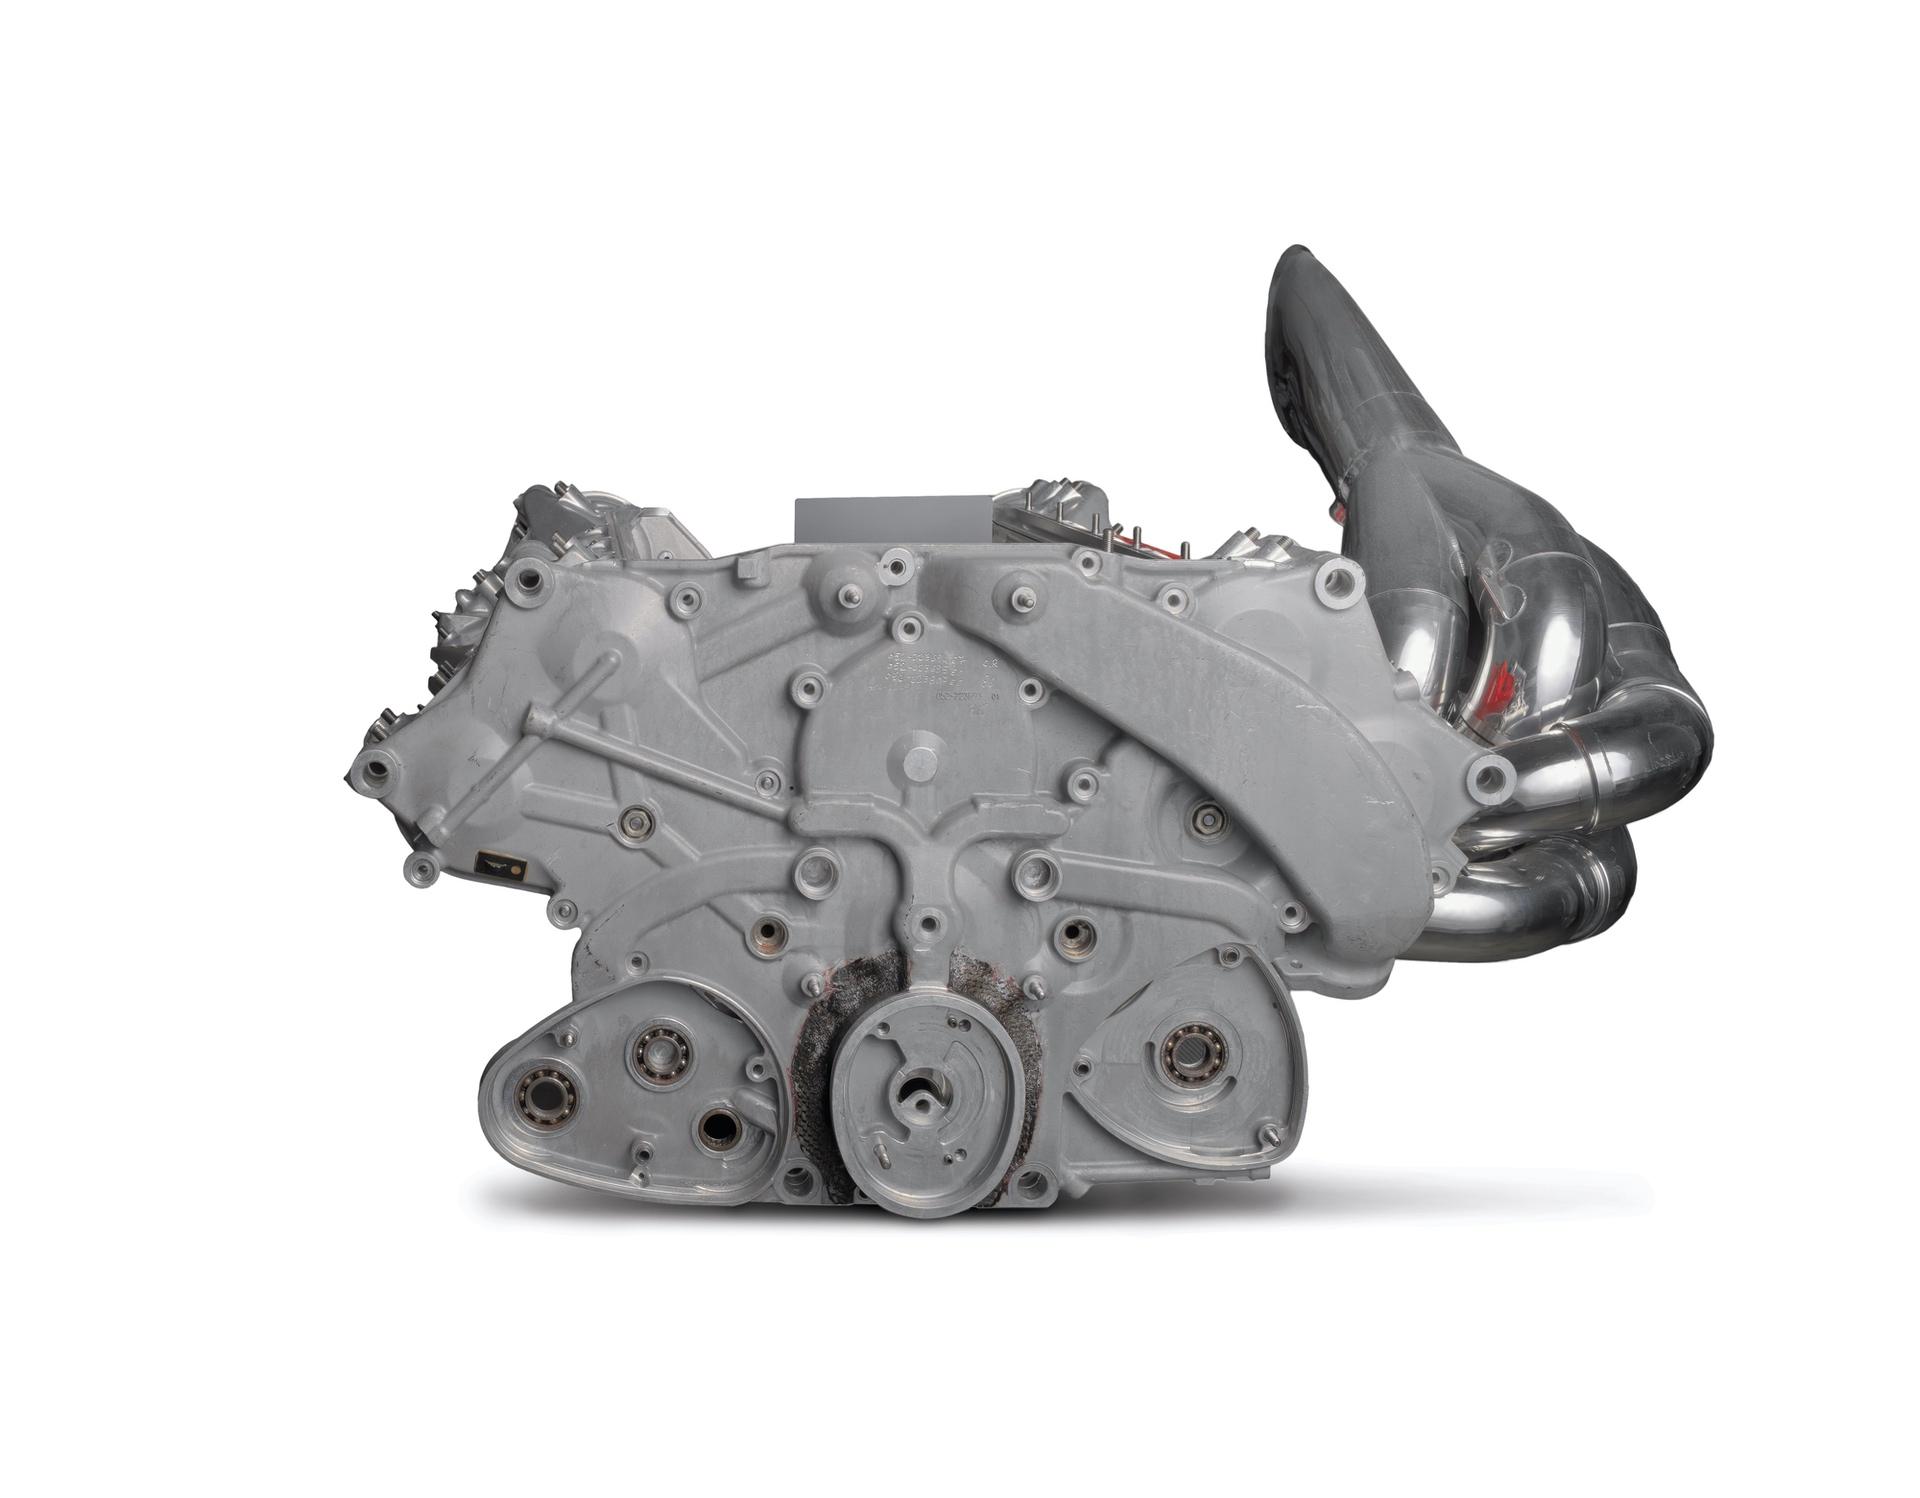 Ferrari_F2003-GA_Engine_0003